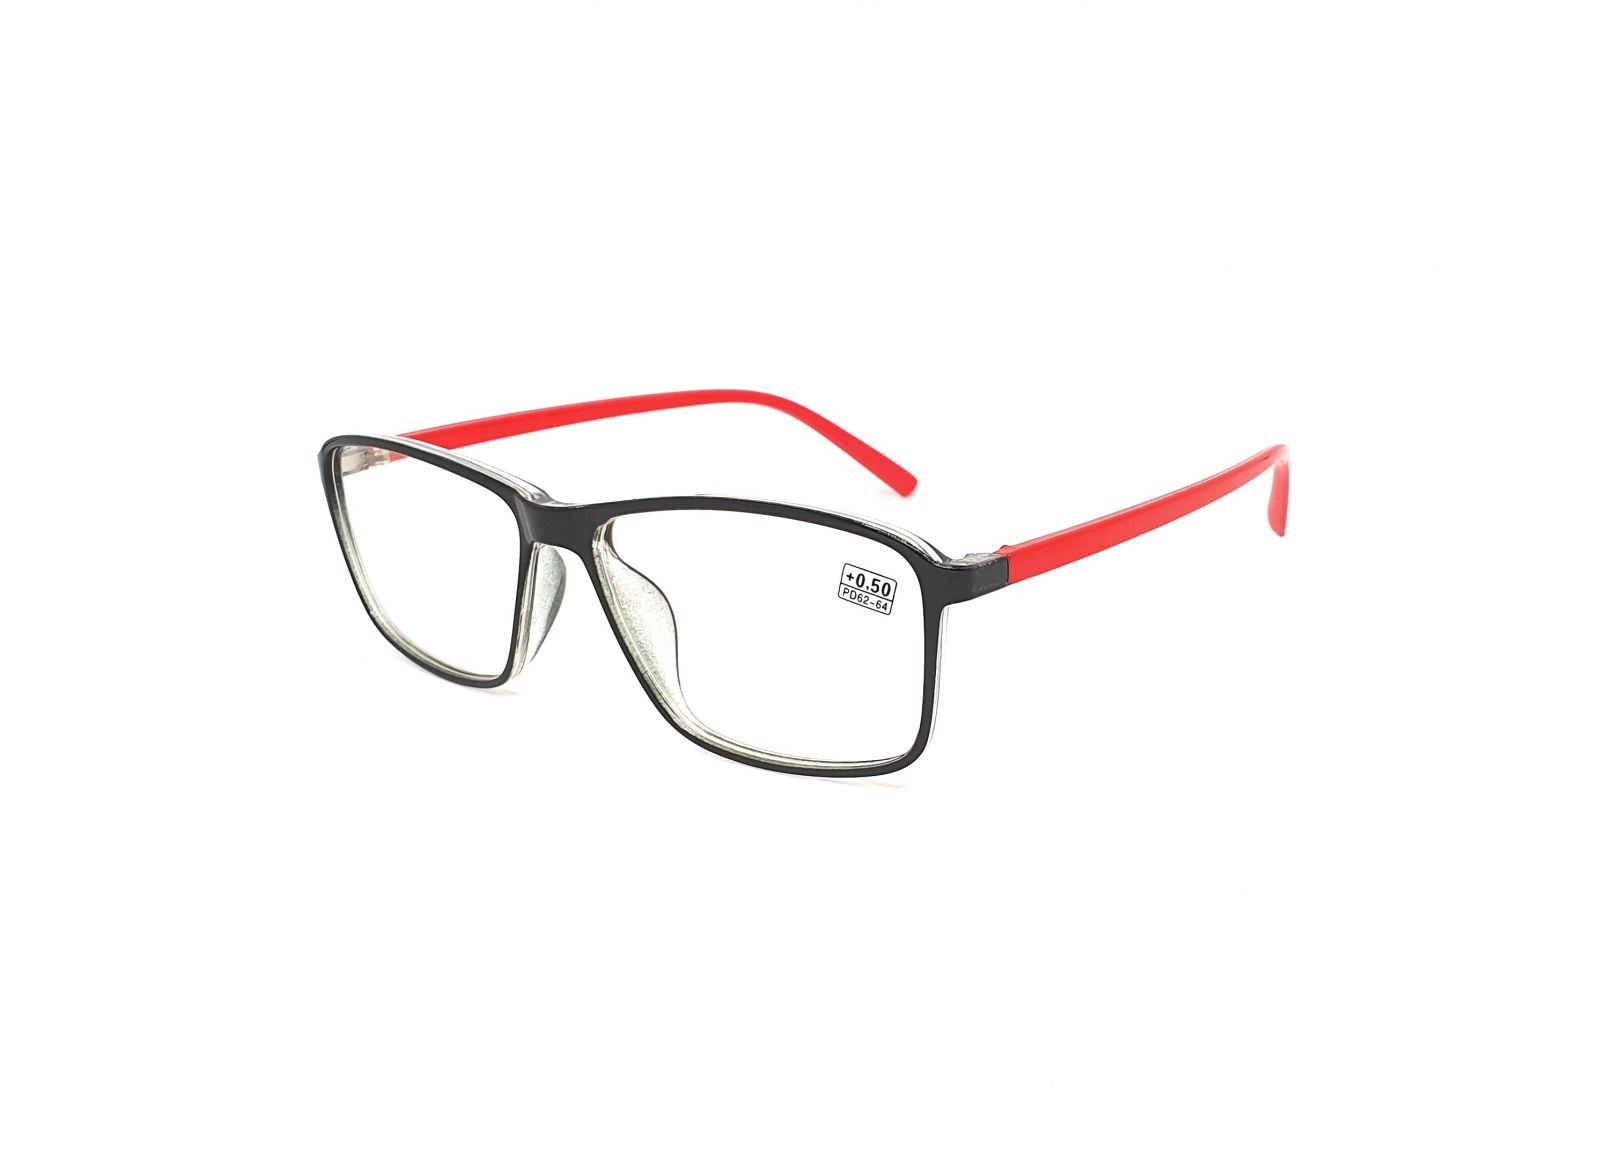 Dioptrické brýle 17218 / +1,25 red